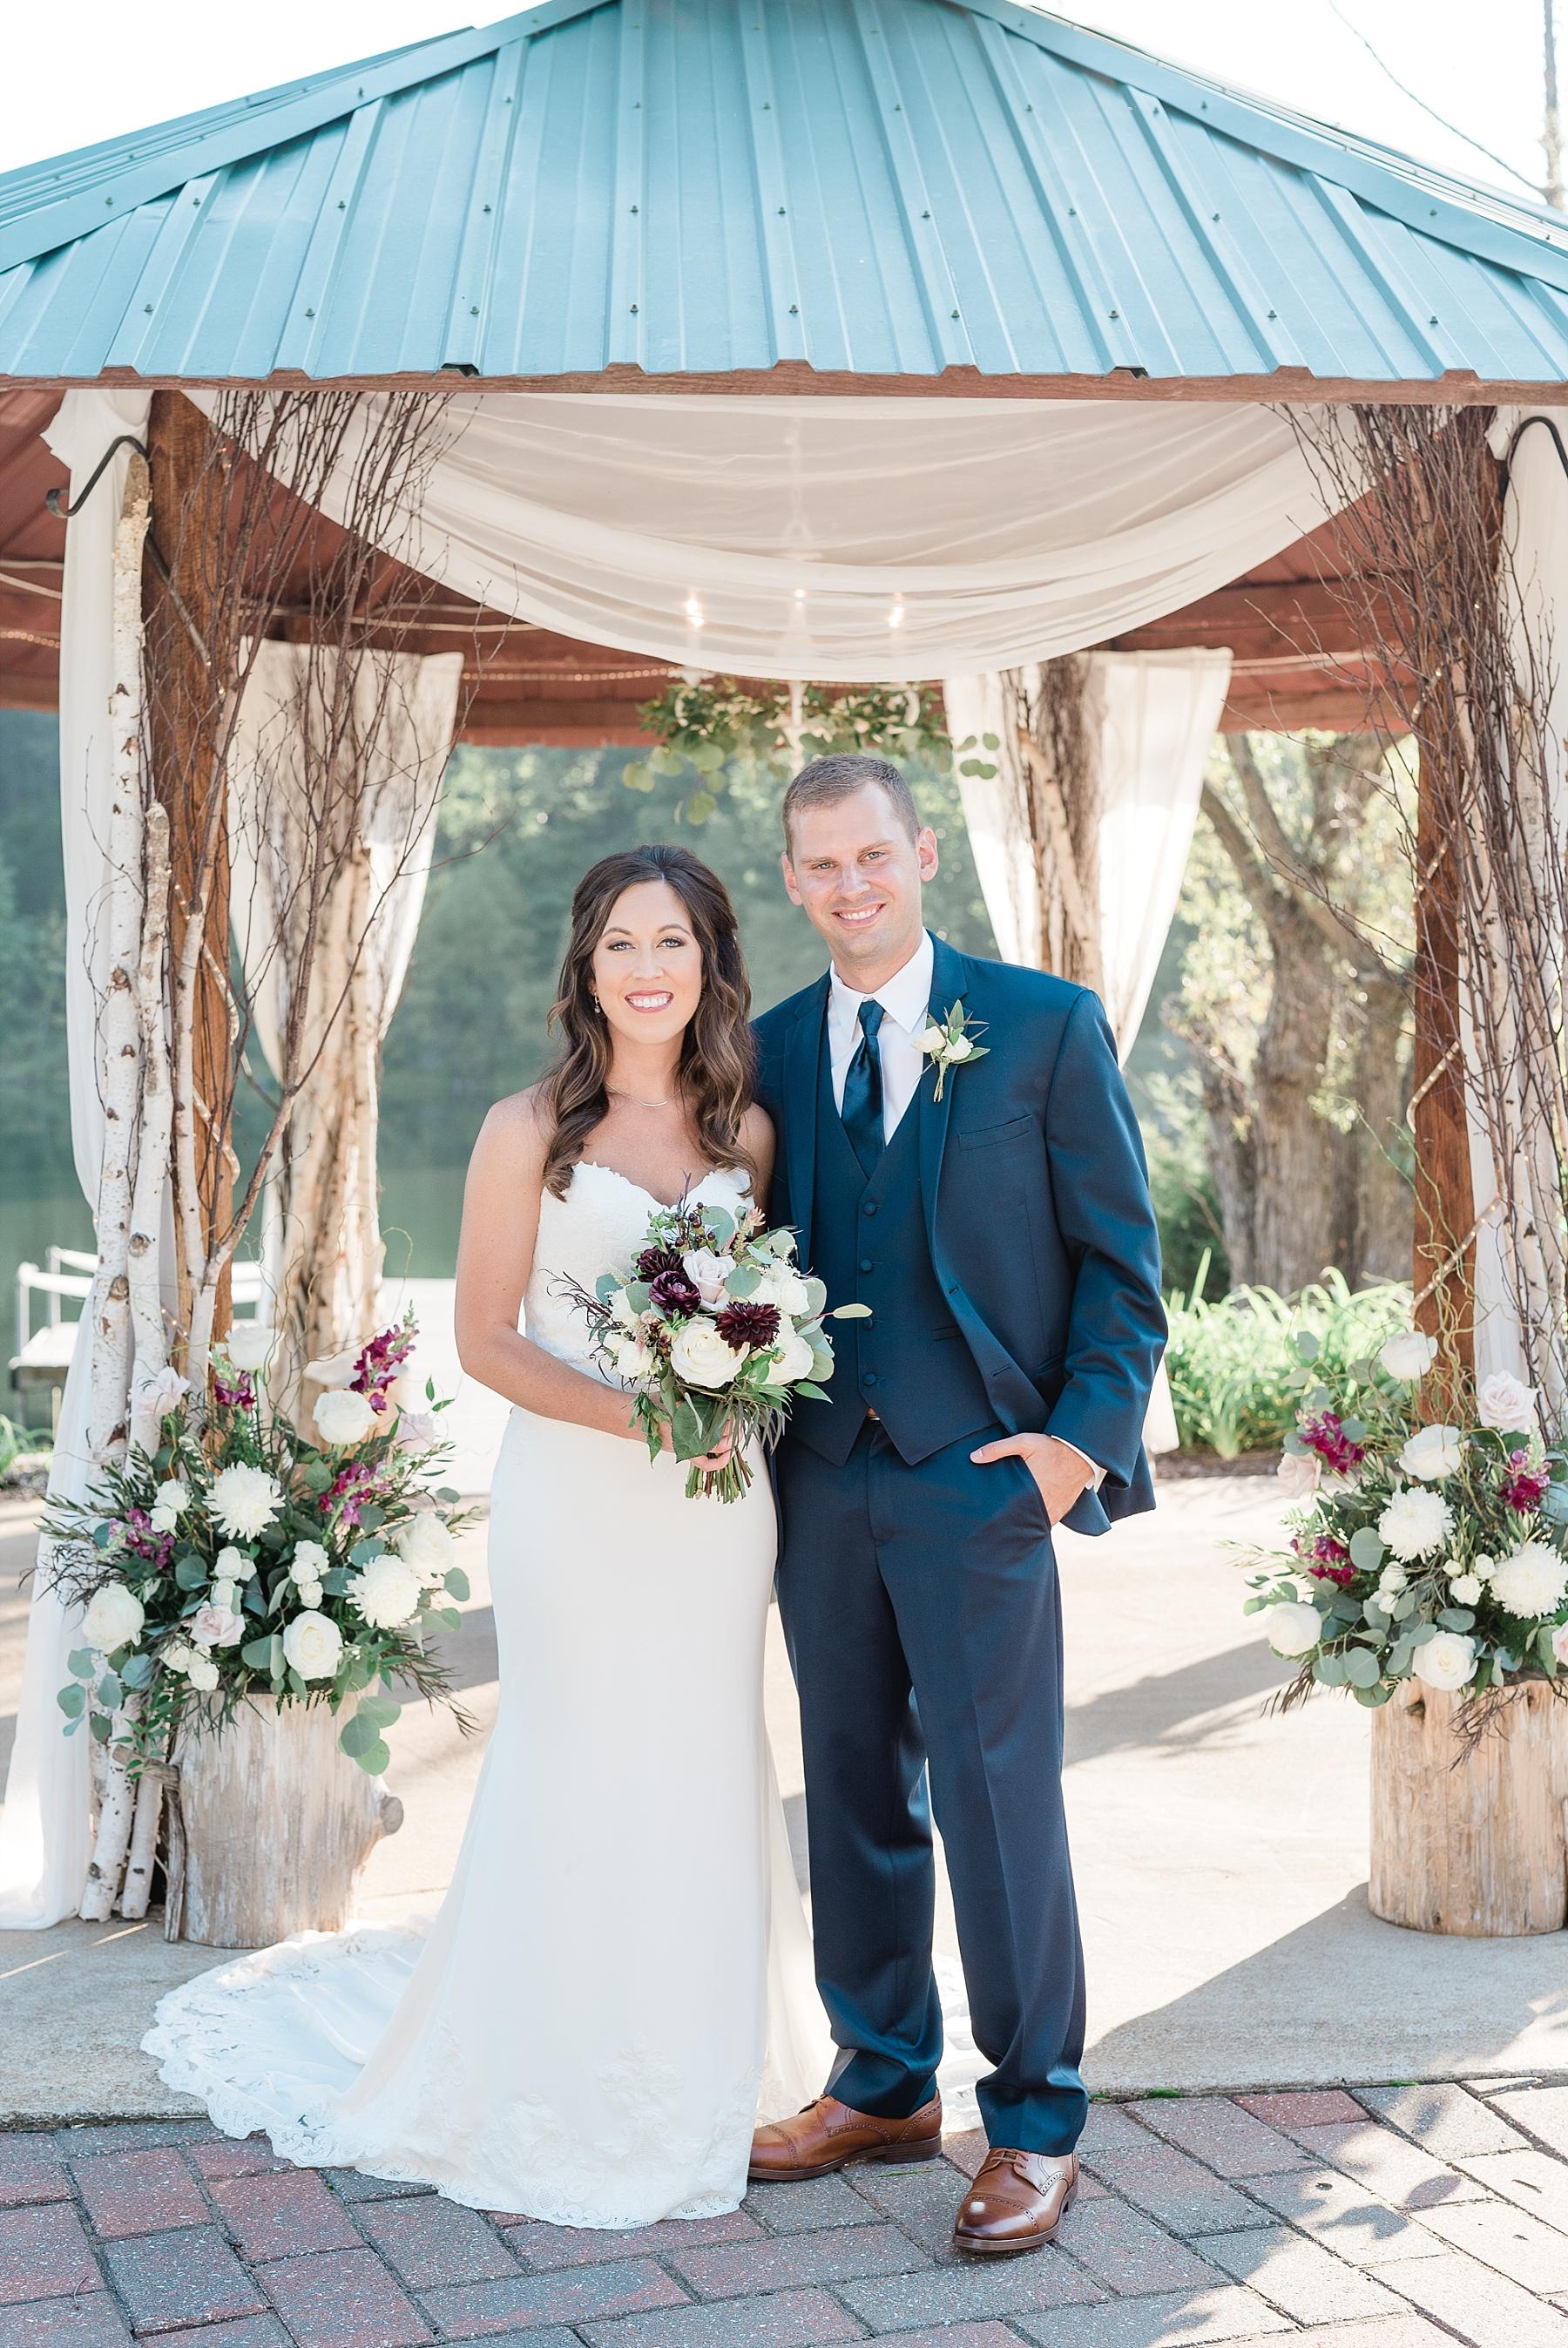 Romantic Summer Sunset Wedding Ceremony at Little Piney Lodge St. Louis Missouri by Kelsi Kliethermes Photography Fine Art Photographer_0038.jpg